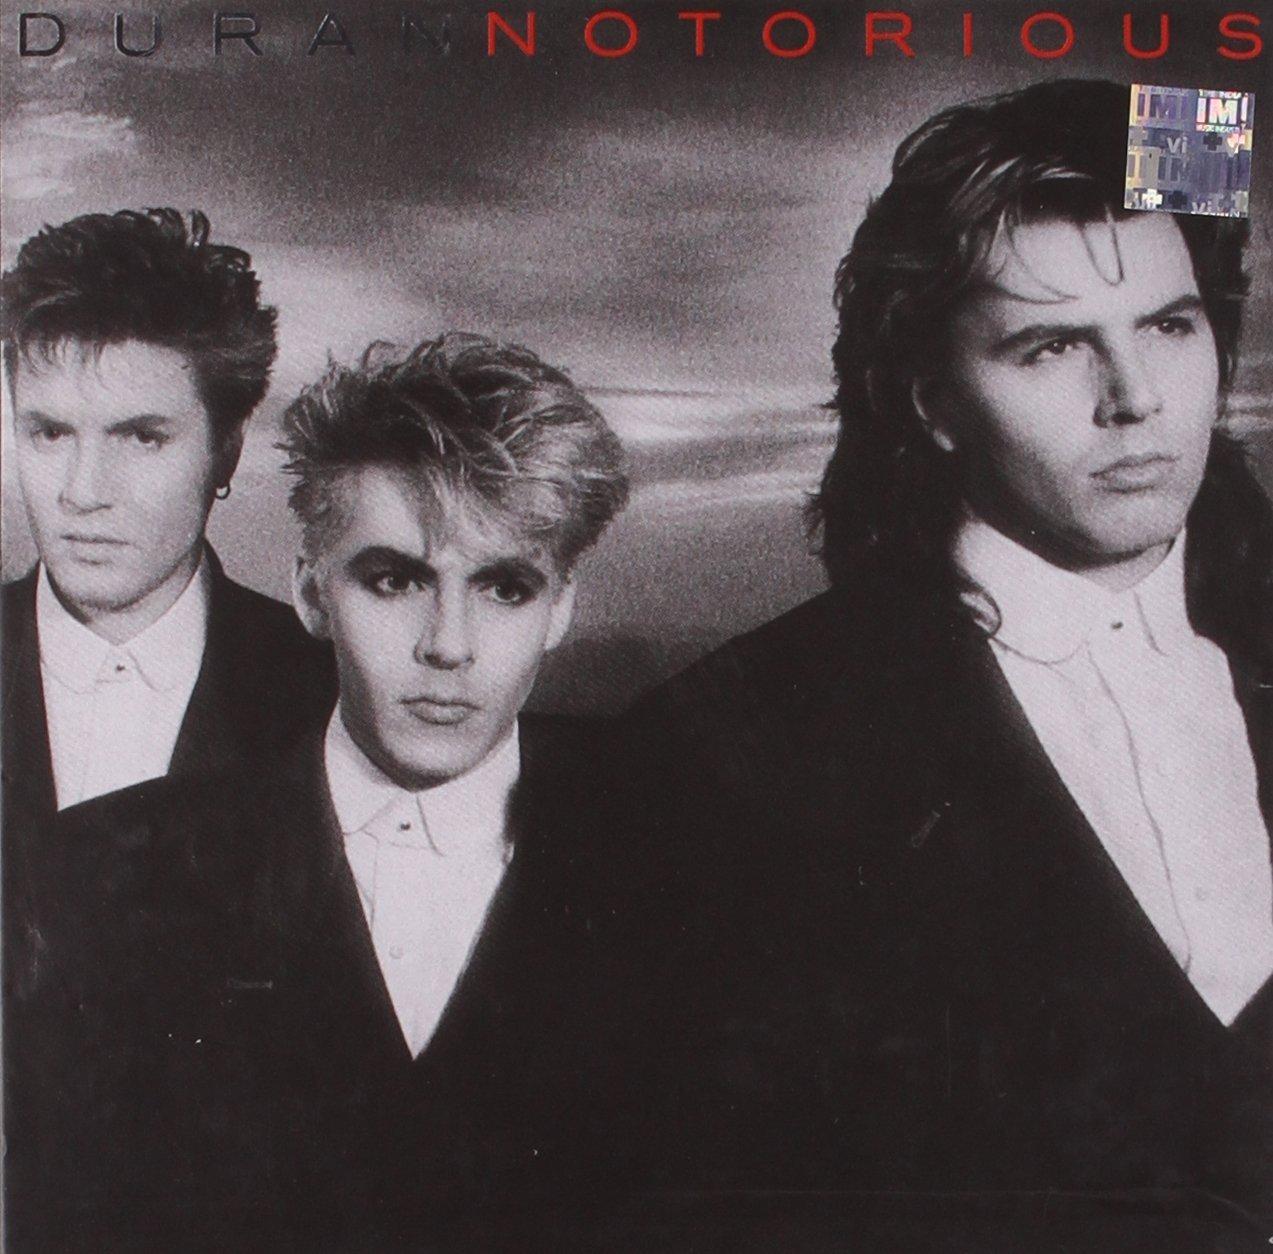 DURAN DURAN - NOTORIOUS (2 CD+DVD) (CD)